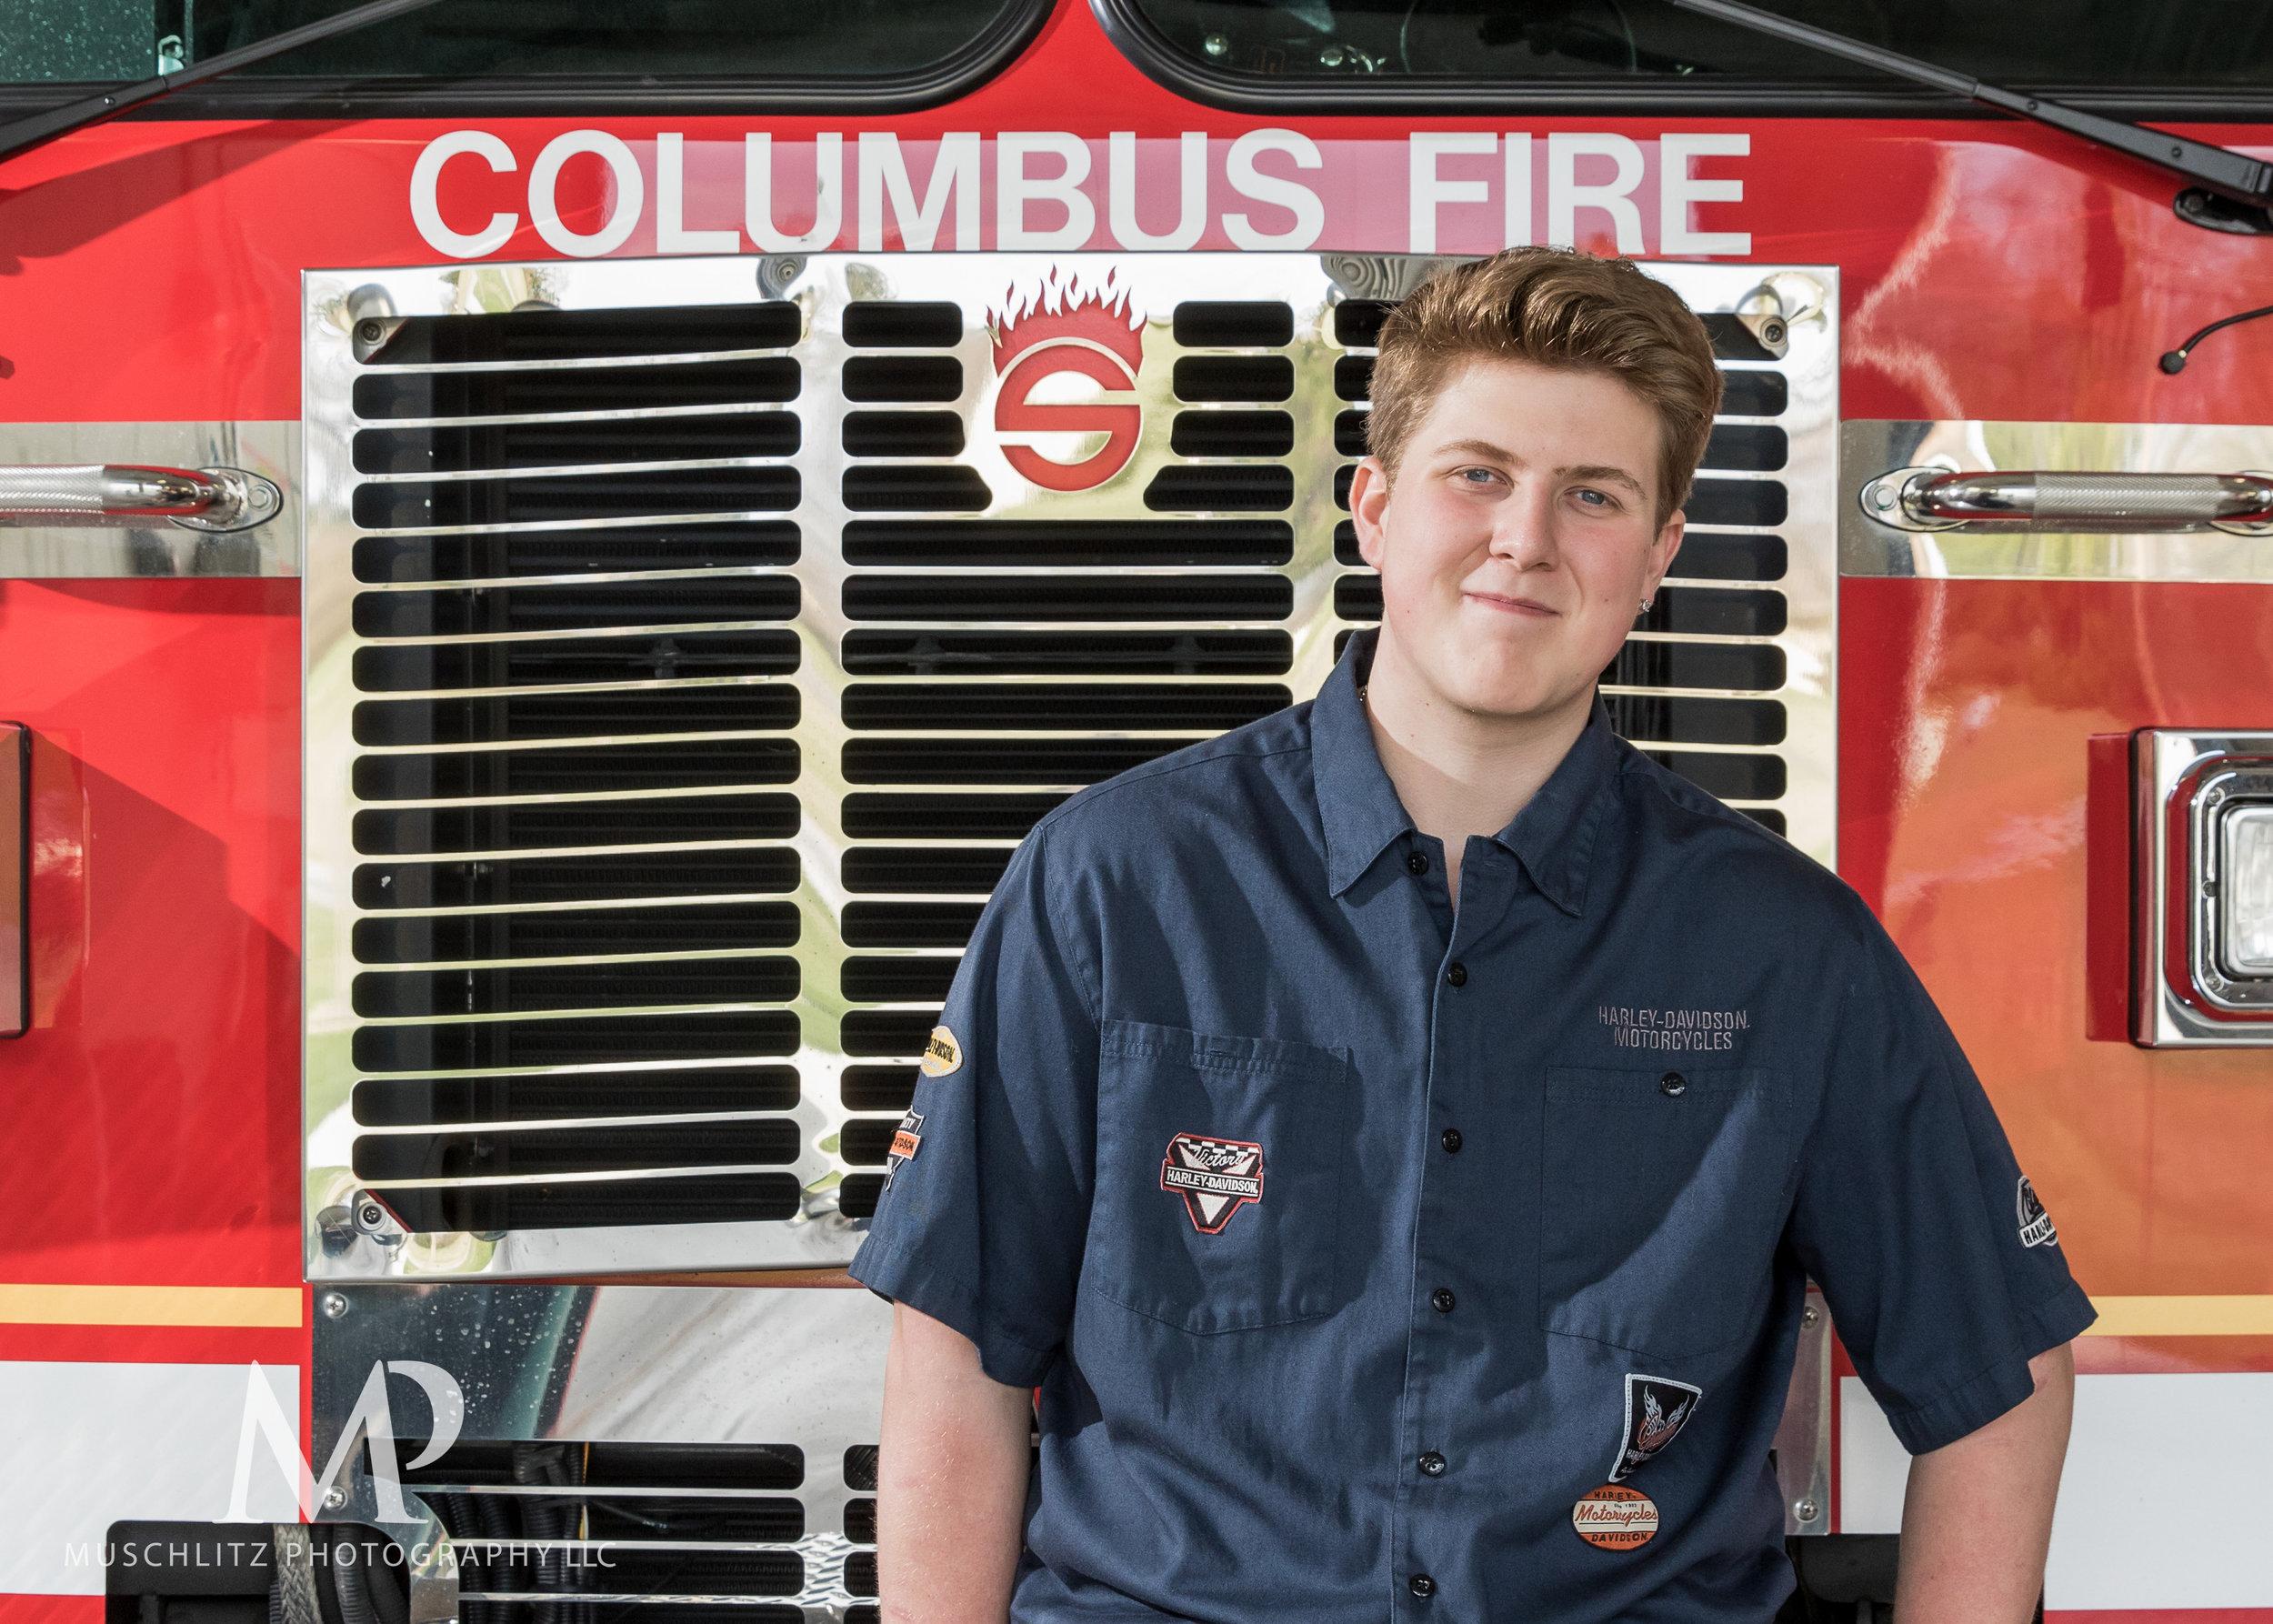 senior-portrait-fire-station-fireman-gahanna-columbus-photographer-studio-013.JPG